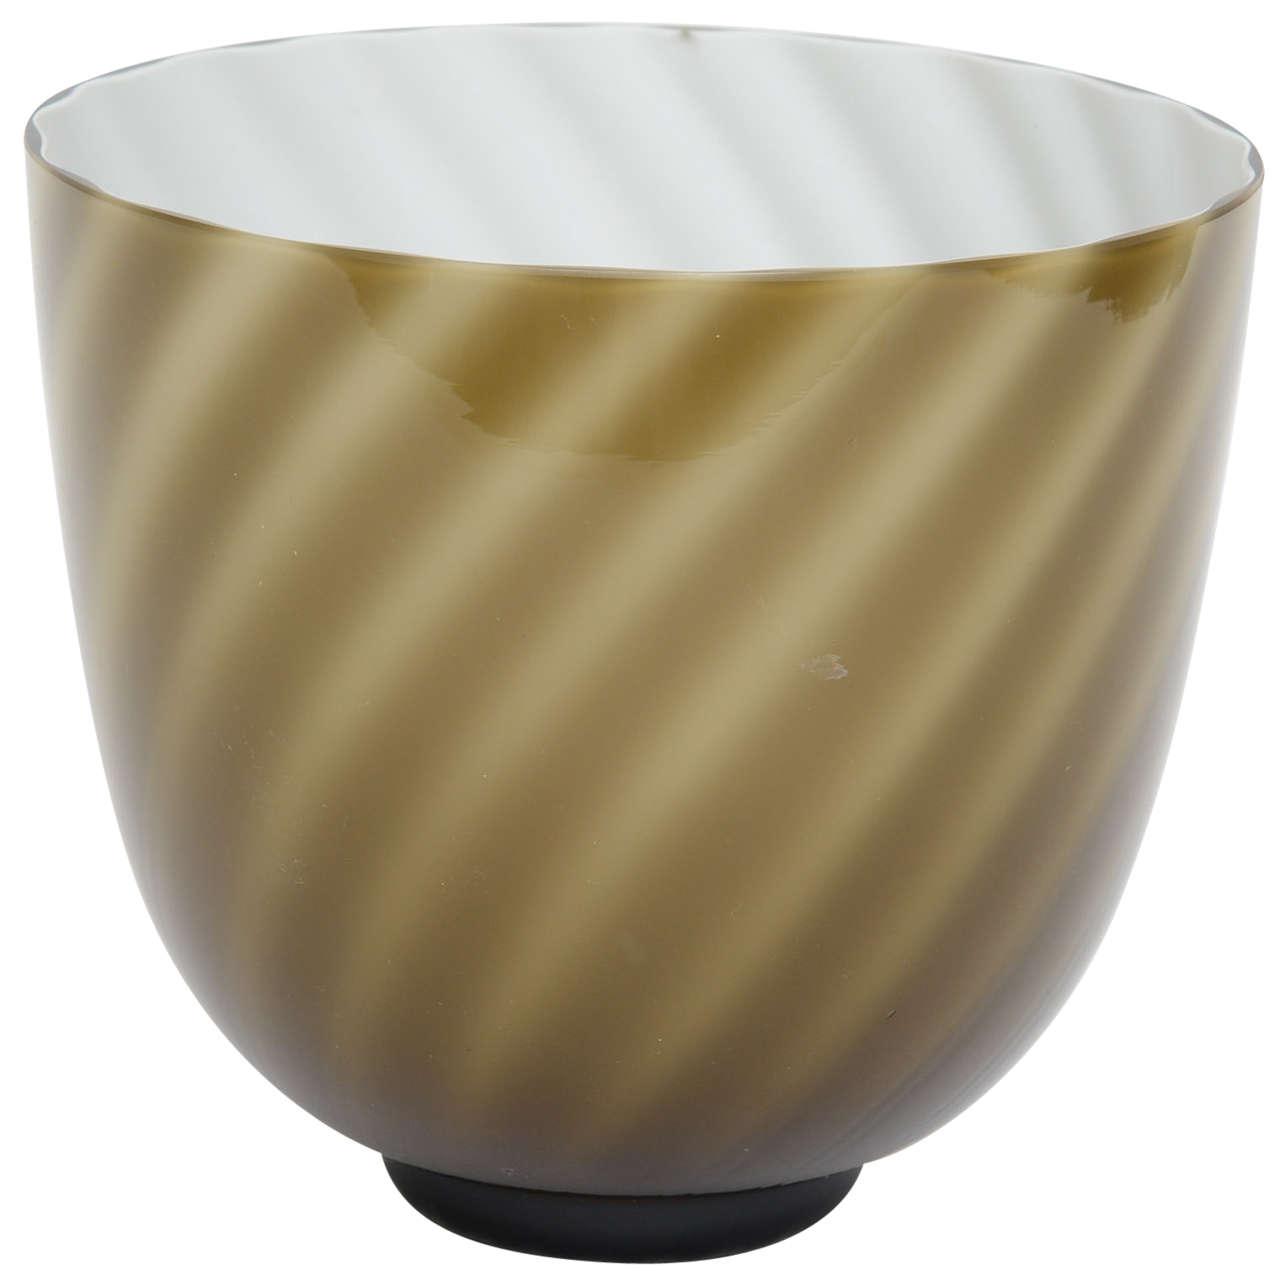 Tommaso Barbi Murano Swirl Vase